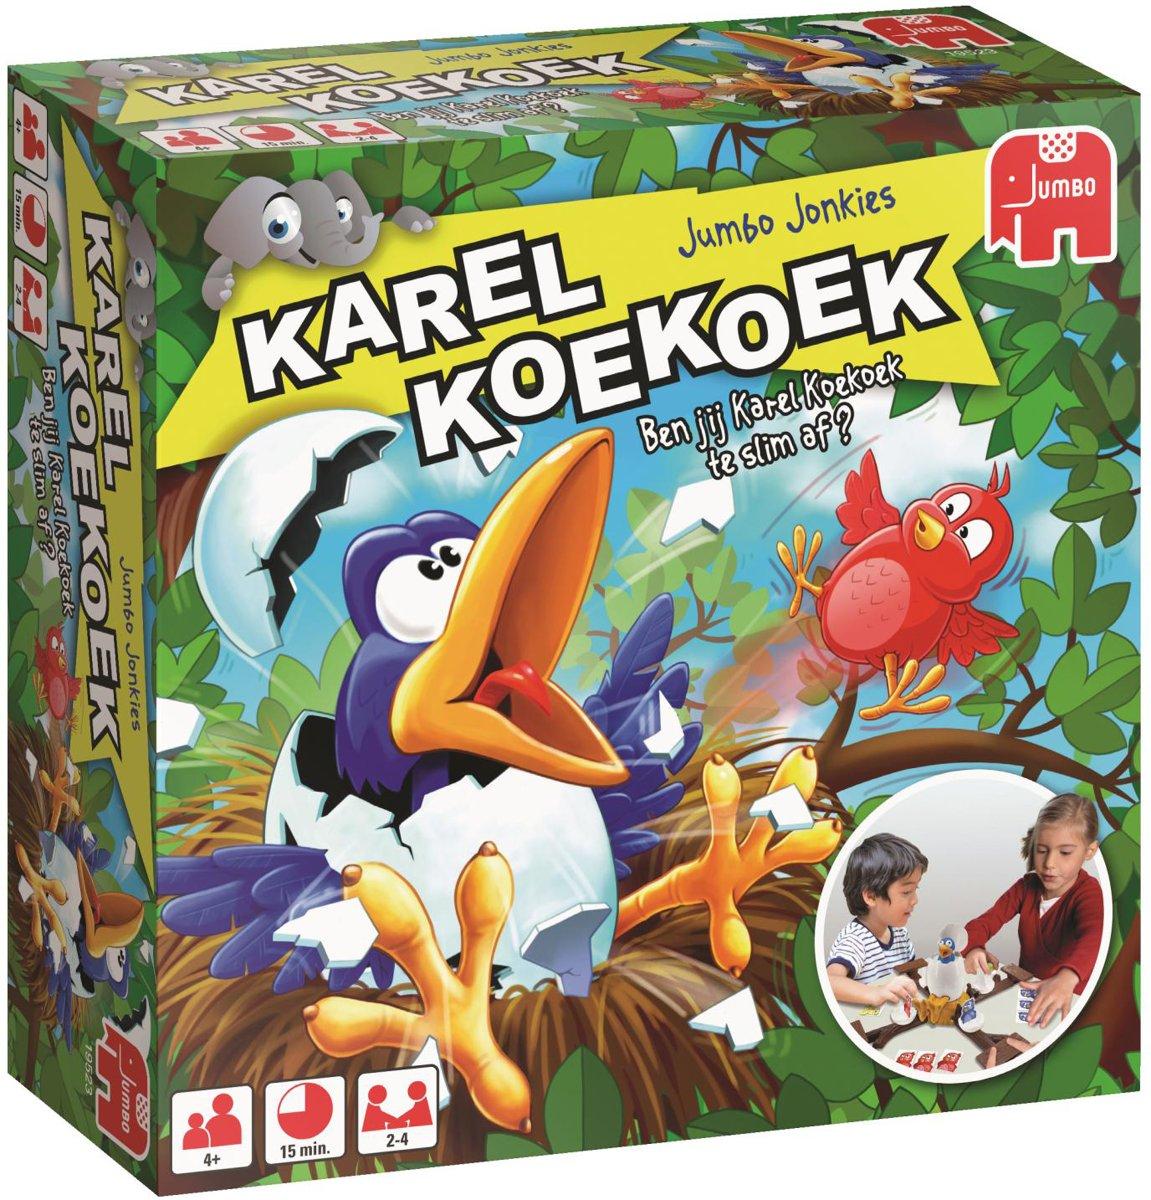 Karel Koekoek - Kinderspel voor €13,99